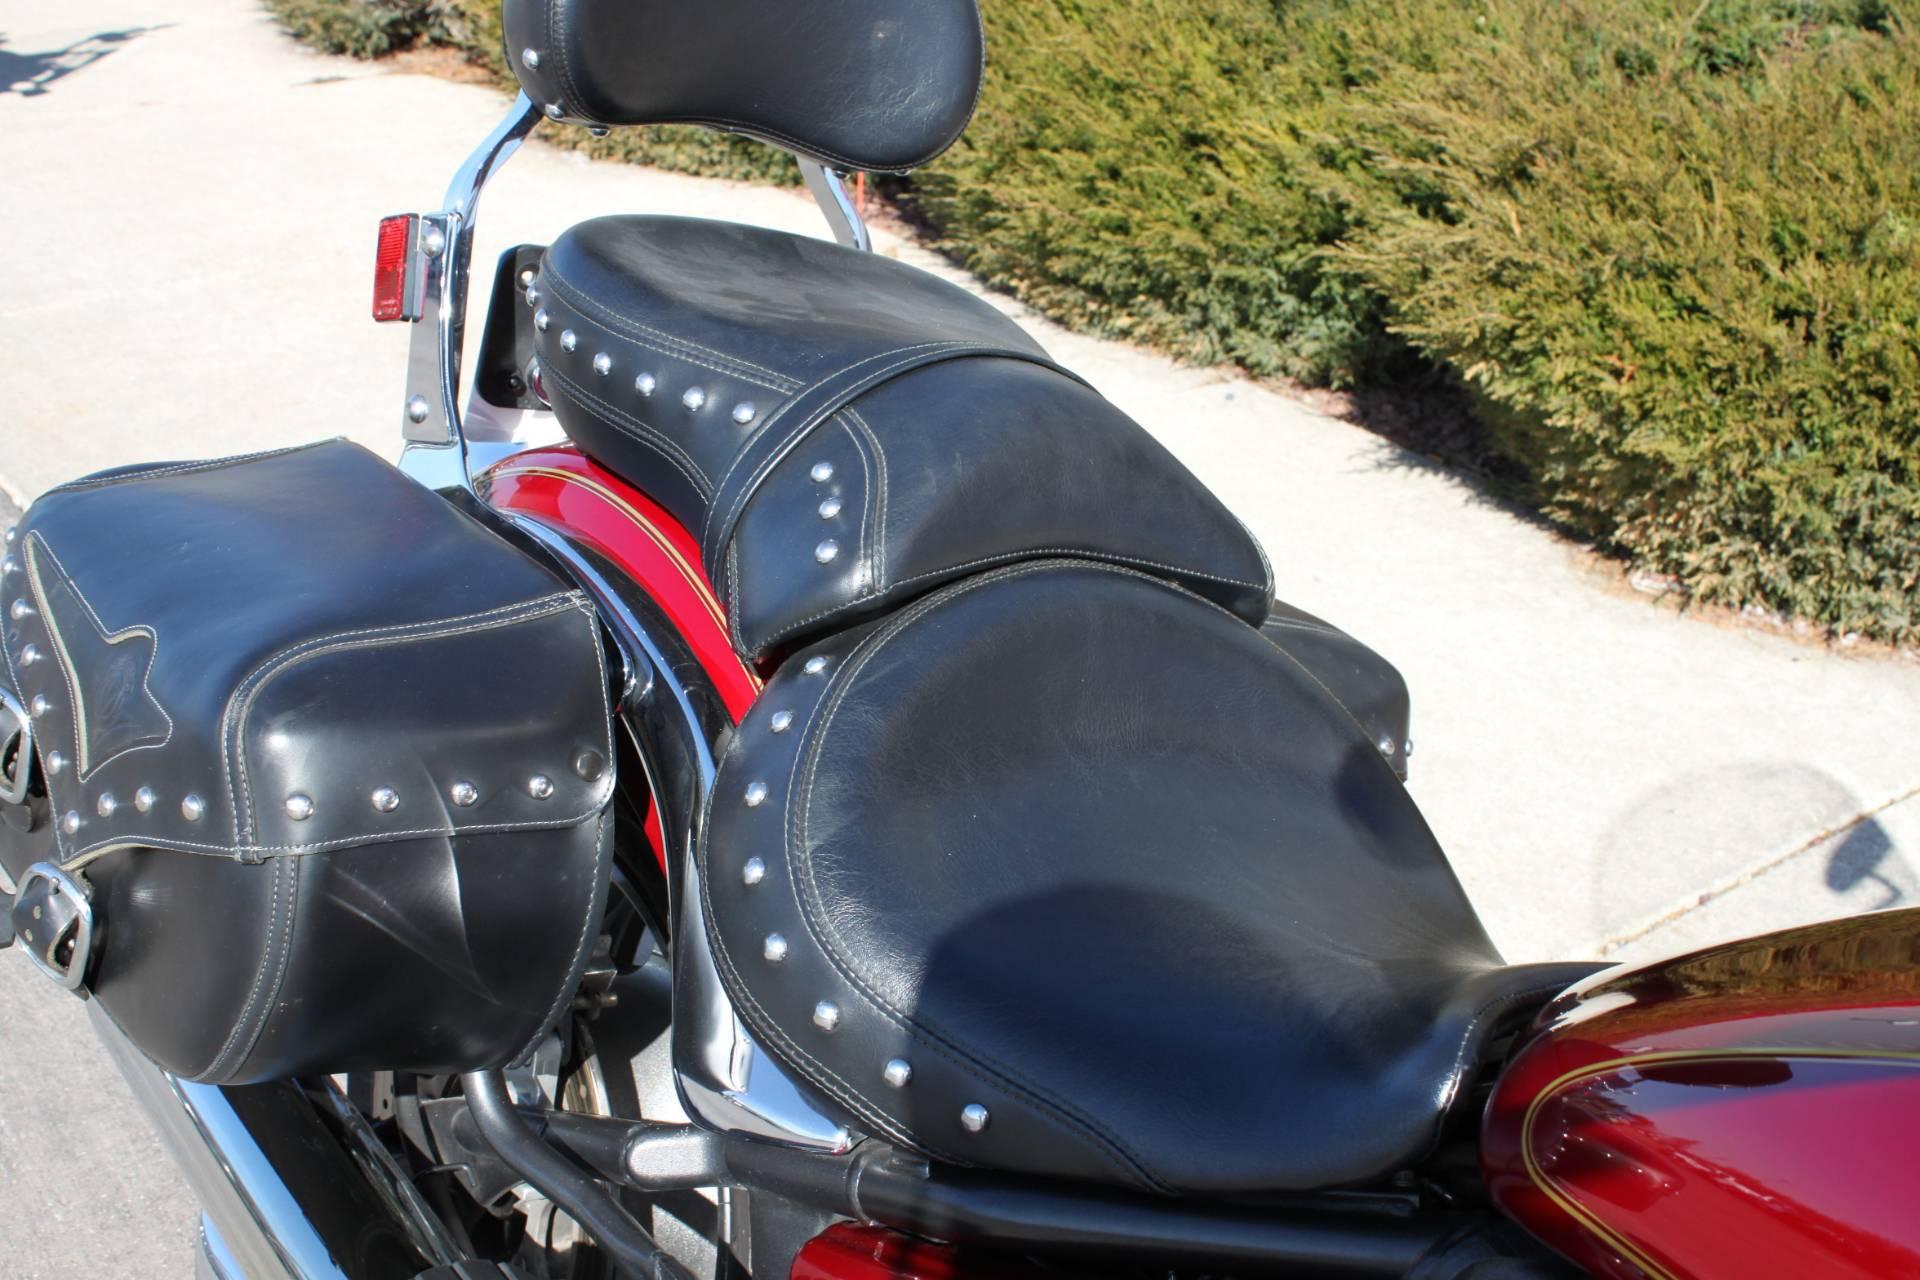 Motorcycle Bike Cover Kawasaki  Vulcan 2000 Classic LT TOP OF THE LINE